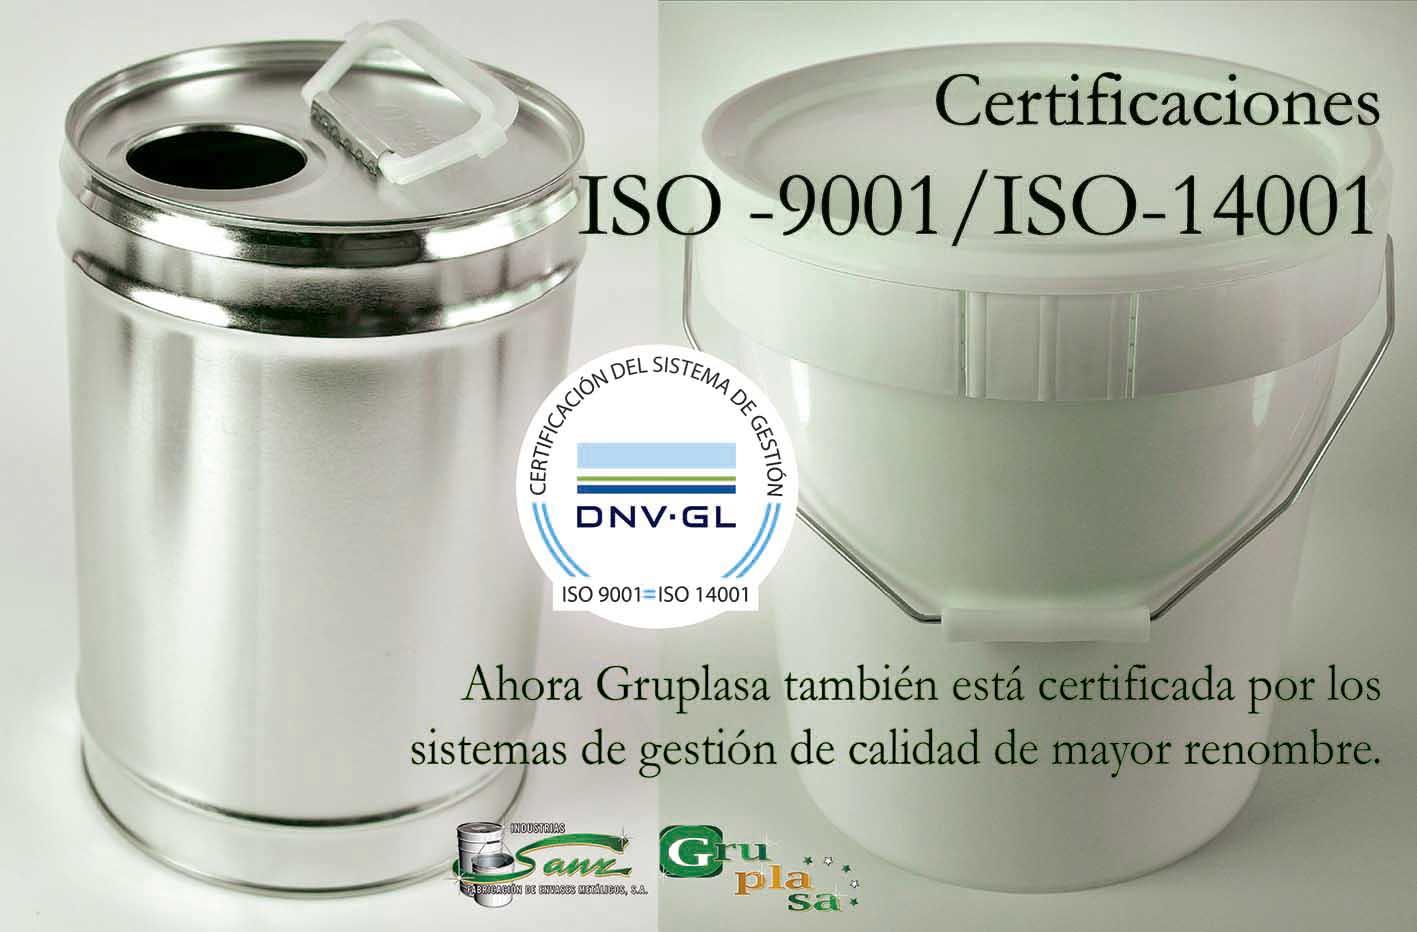 certificaciones iso-9001/iso-14001